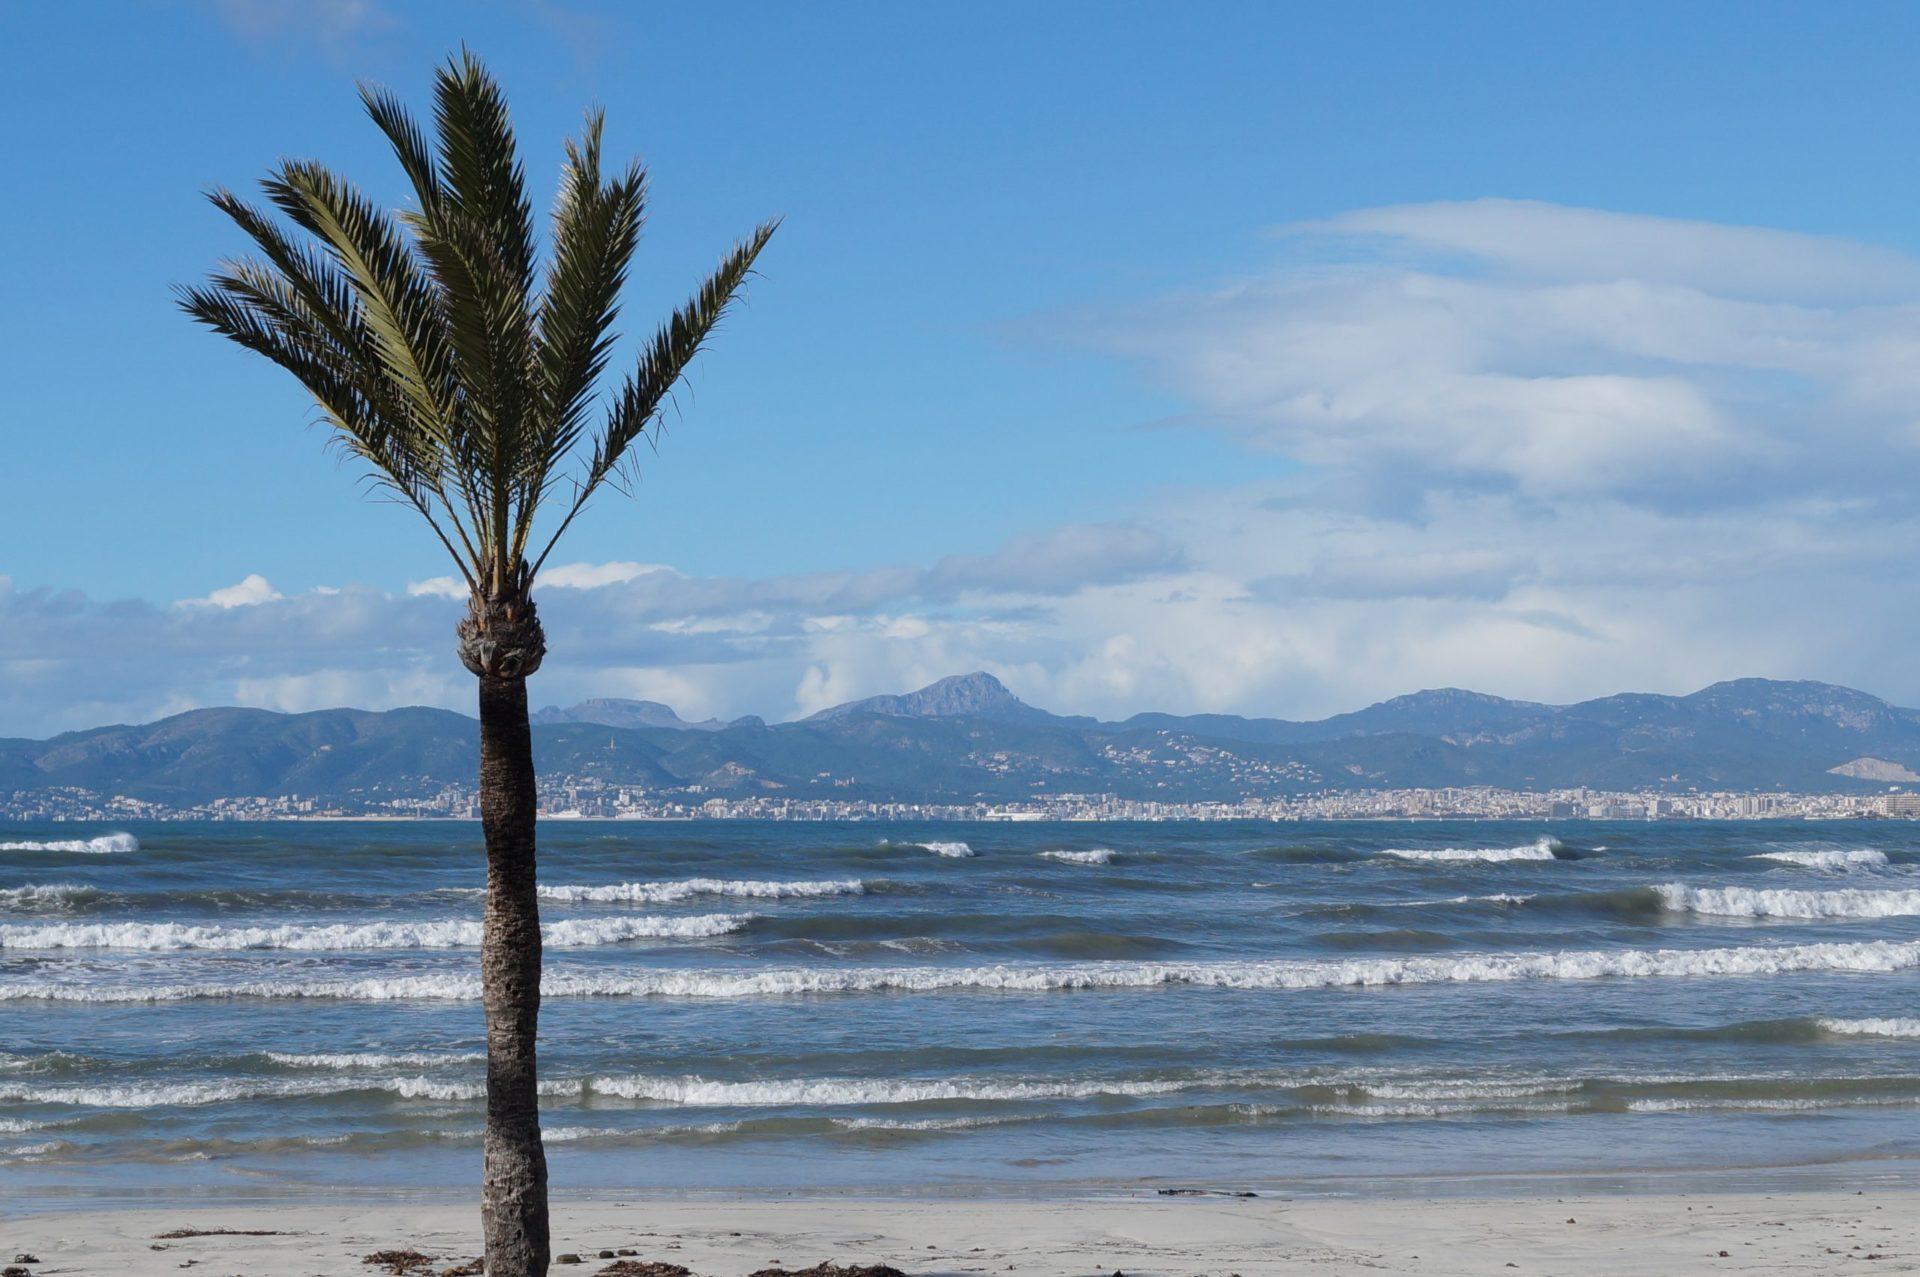 Wassertemperatur Playa de Palma